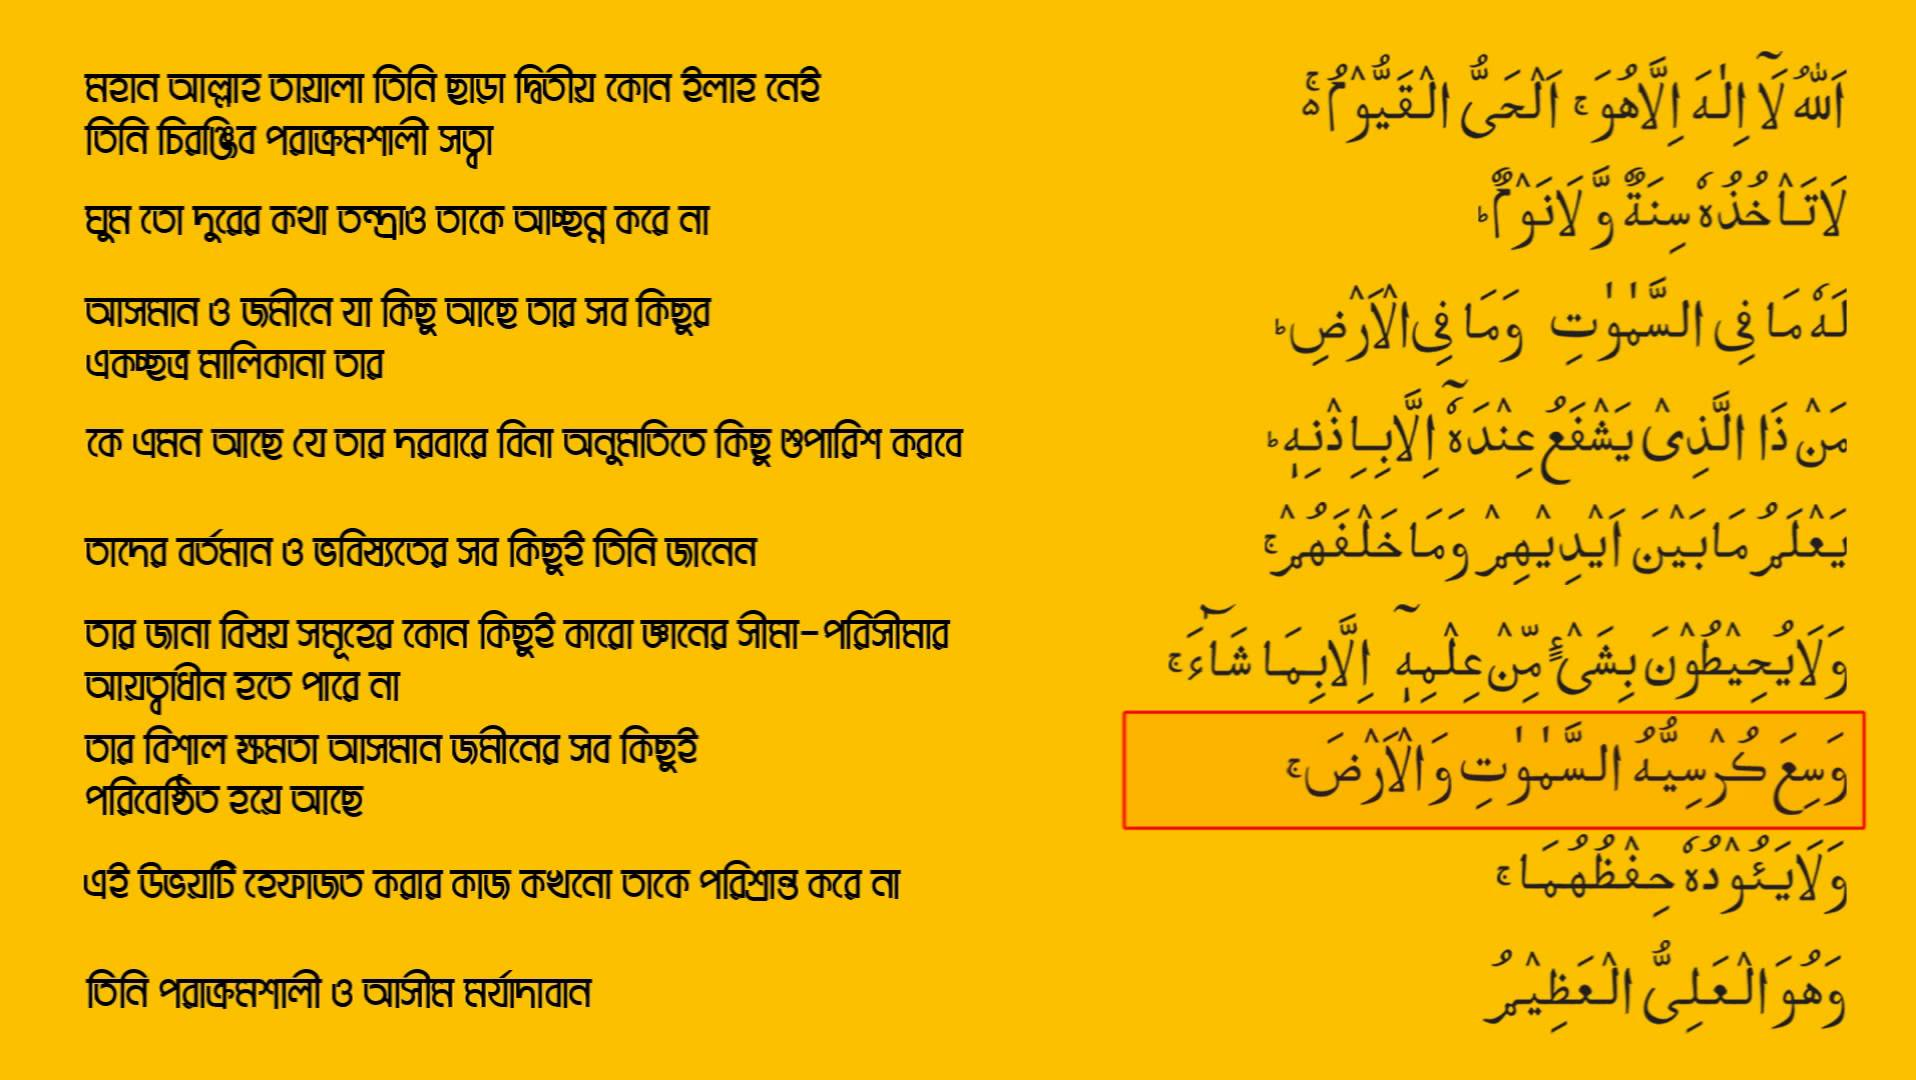 SURAH AYATUL KURSI IN BANGLA DOWNLOAD